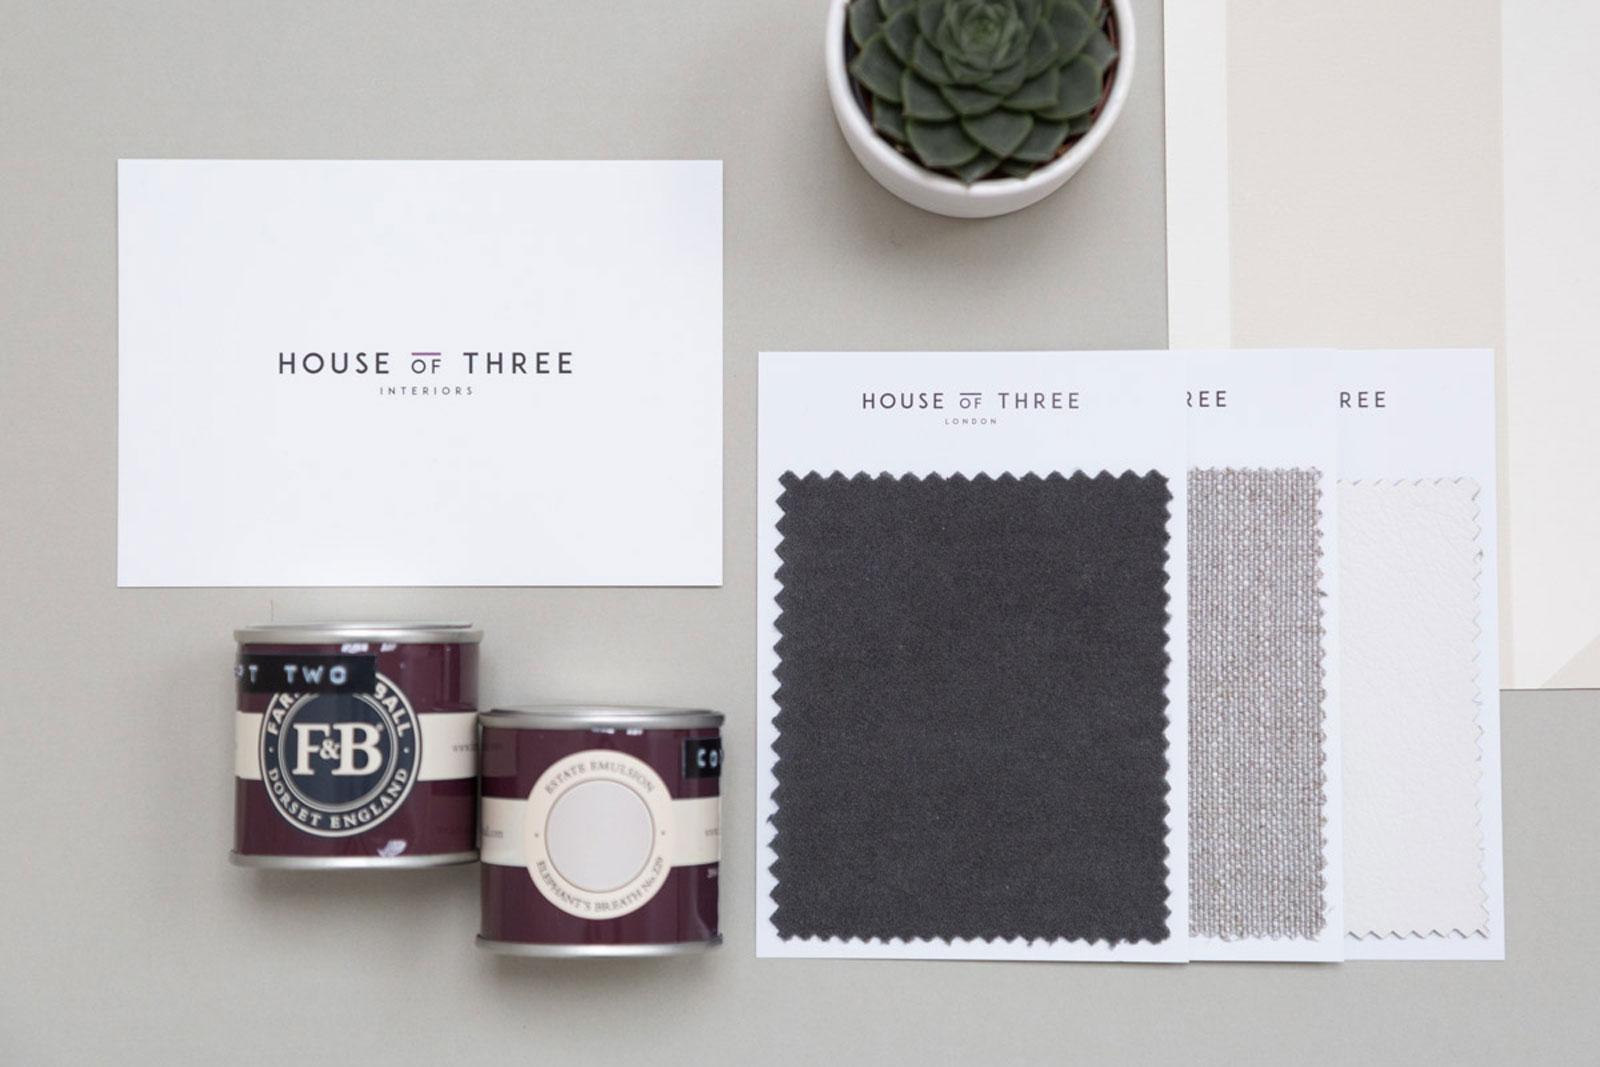 Guide to Fabrics, Fabric Guide, Fabrics, Upholstery Fabrics, Upholstery Fabric, Fabric for Interiors